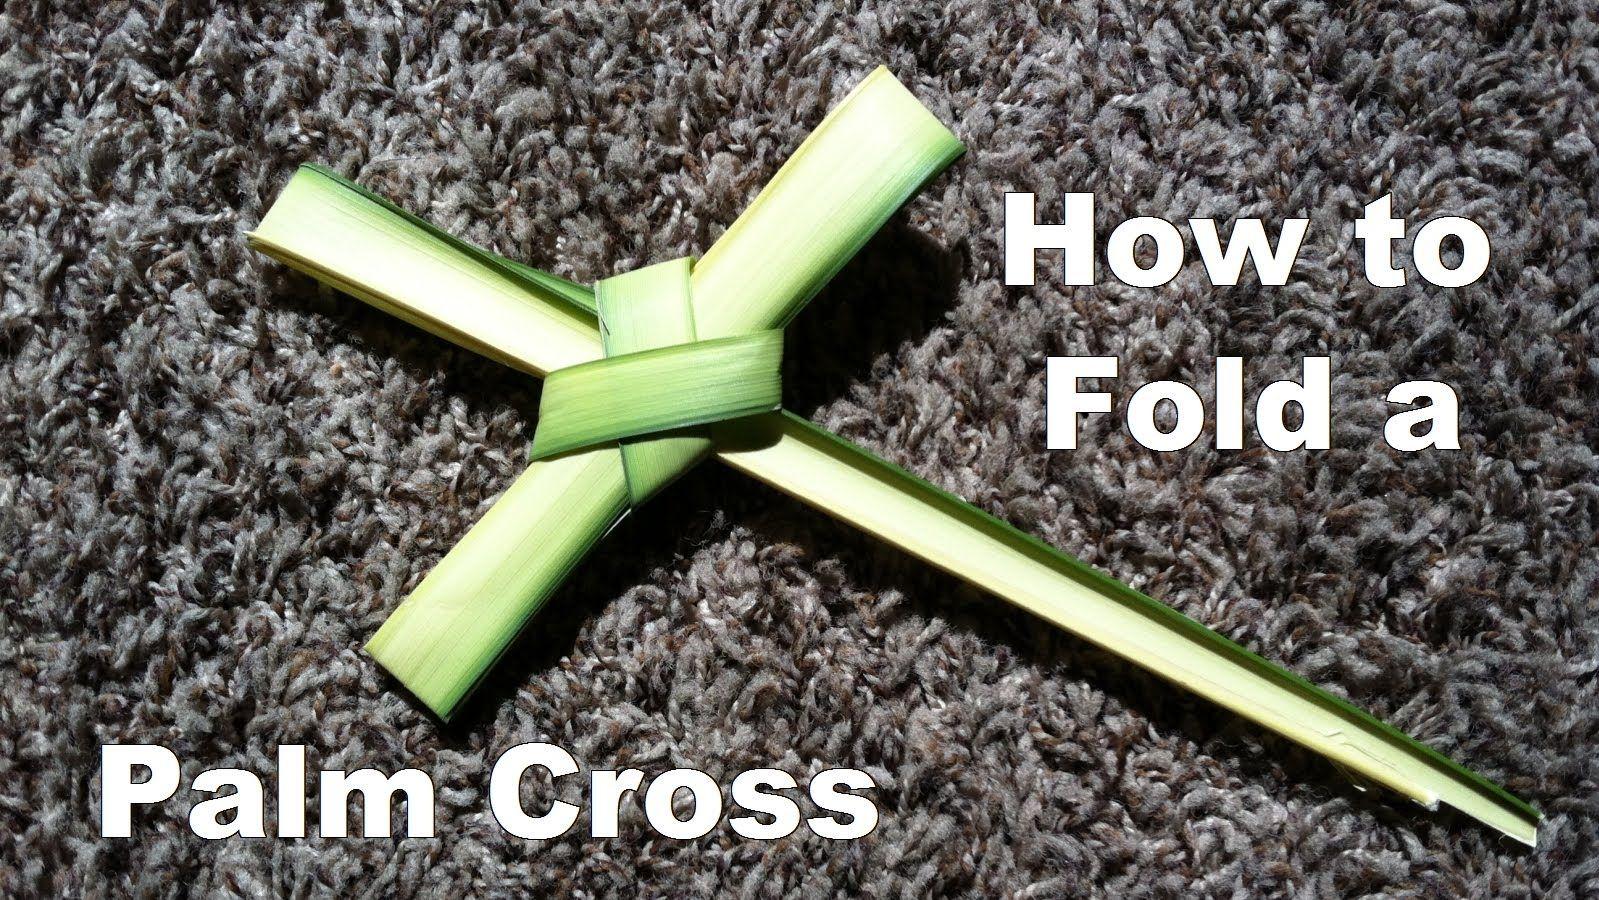 How to fold a palm cross palm cross palm sunday palm